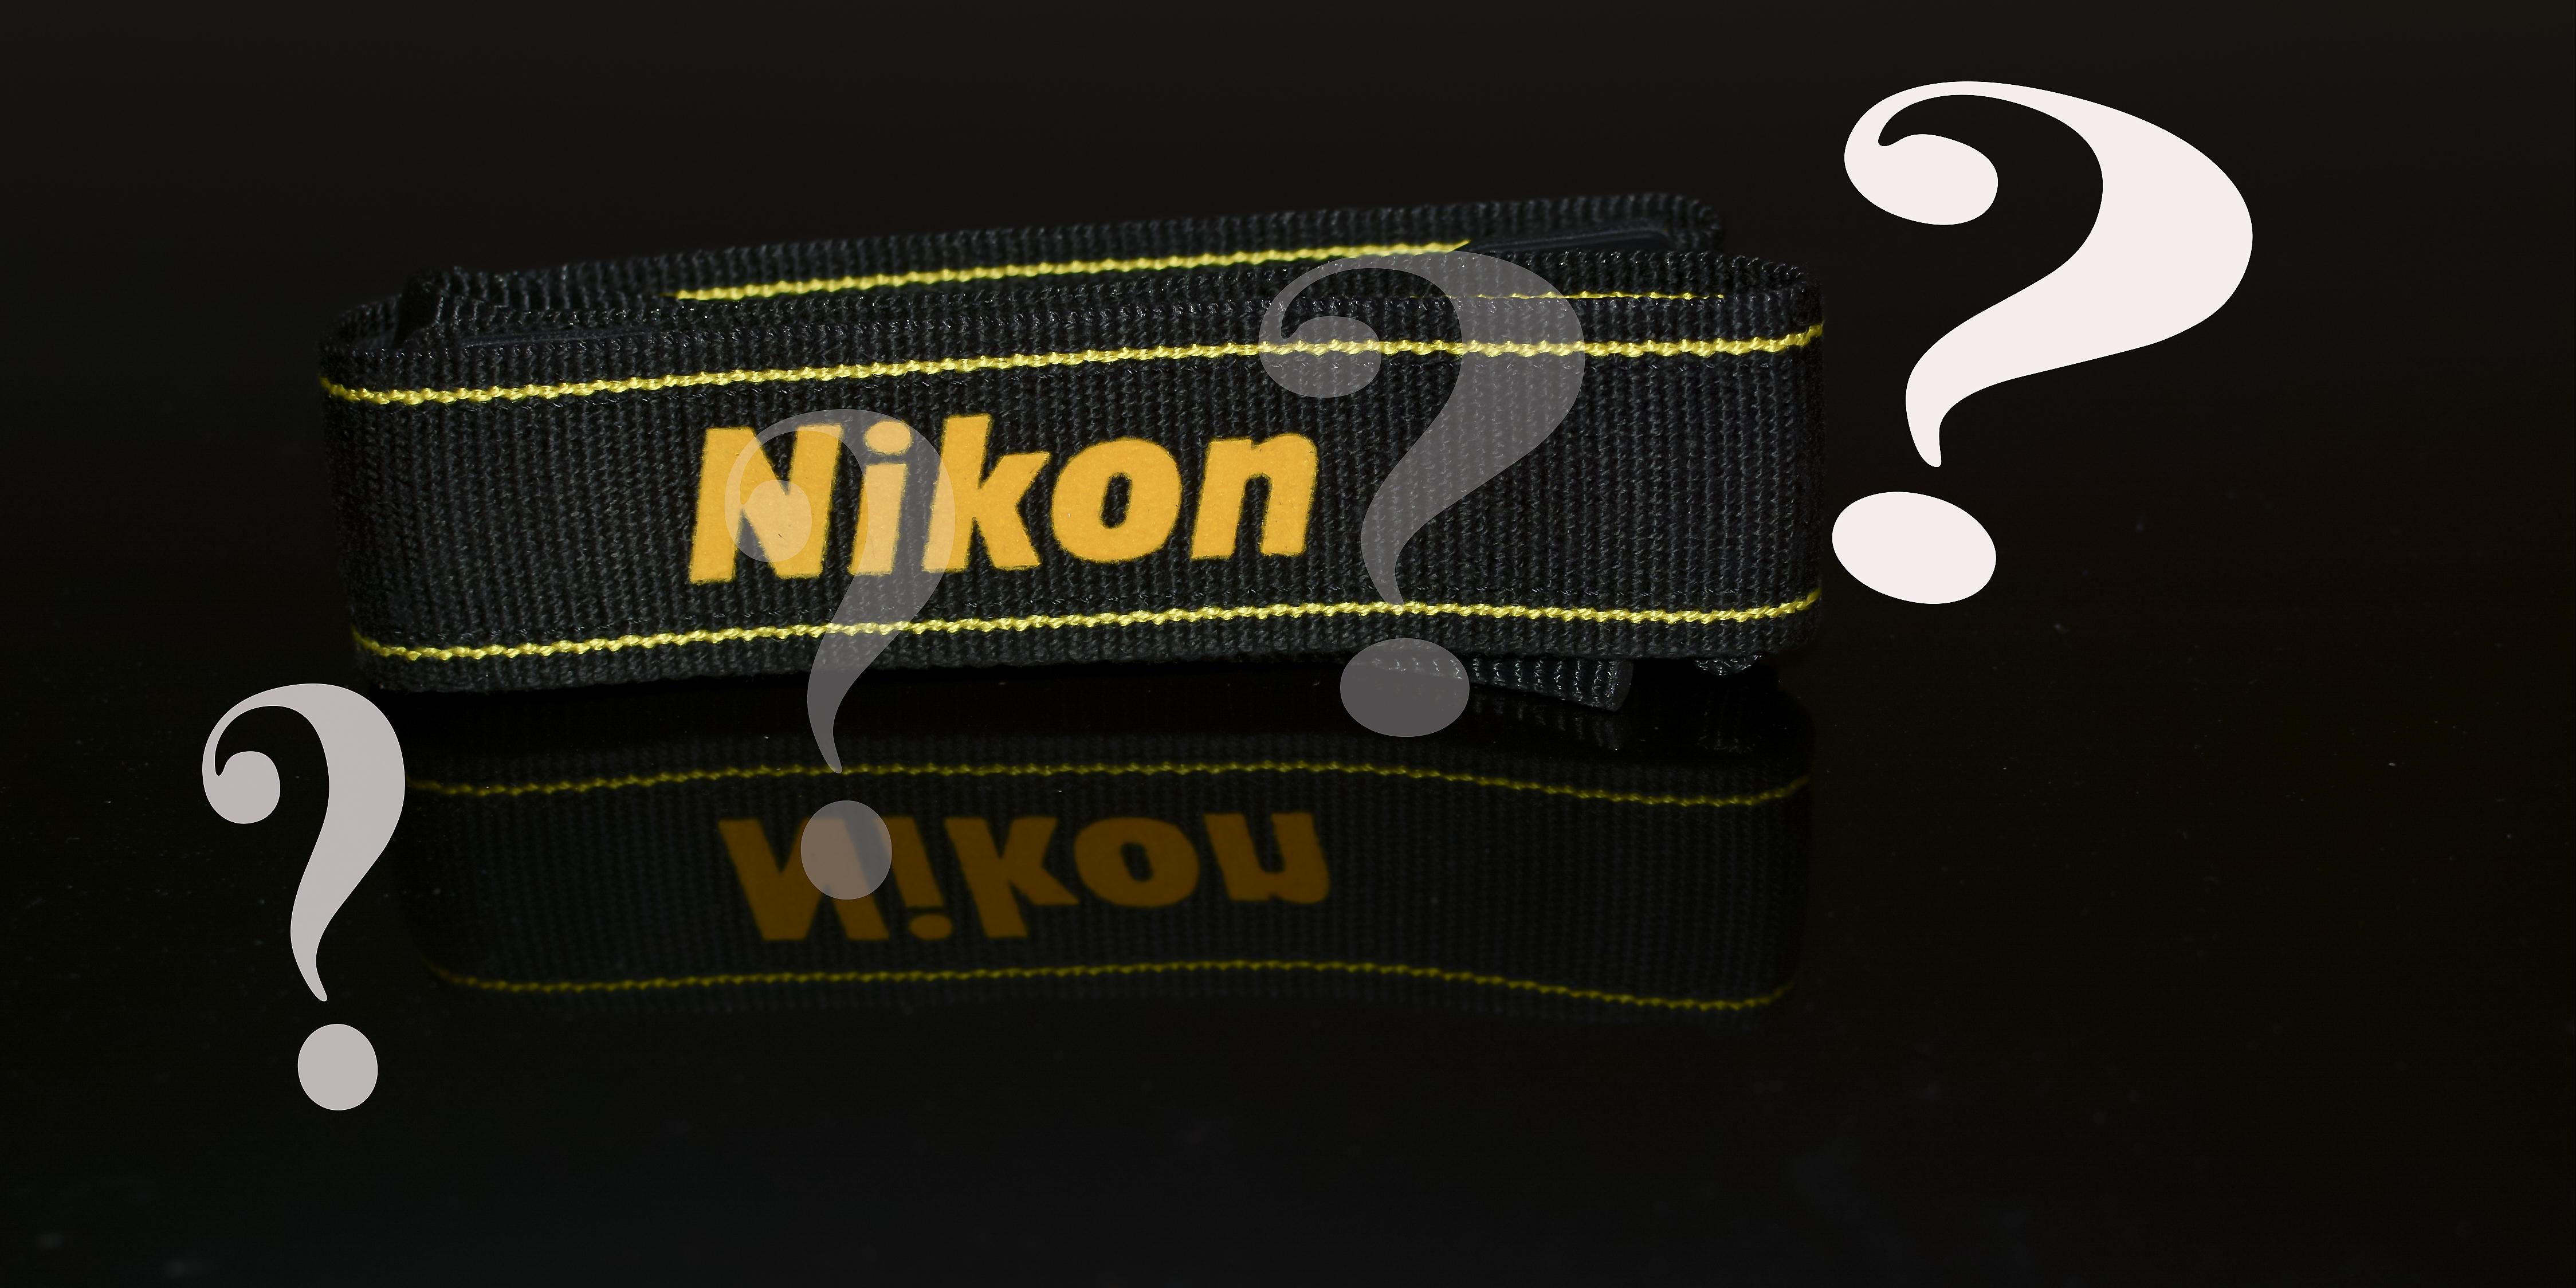 The Best Nikon Cameras 2019